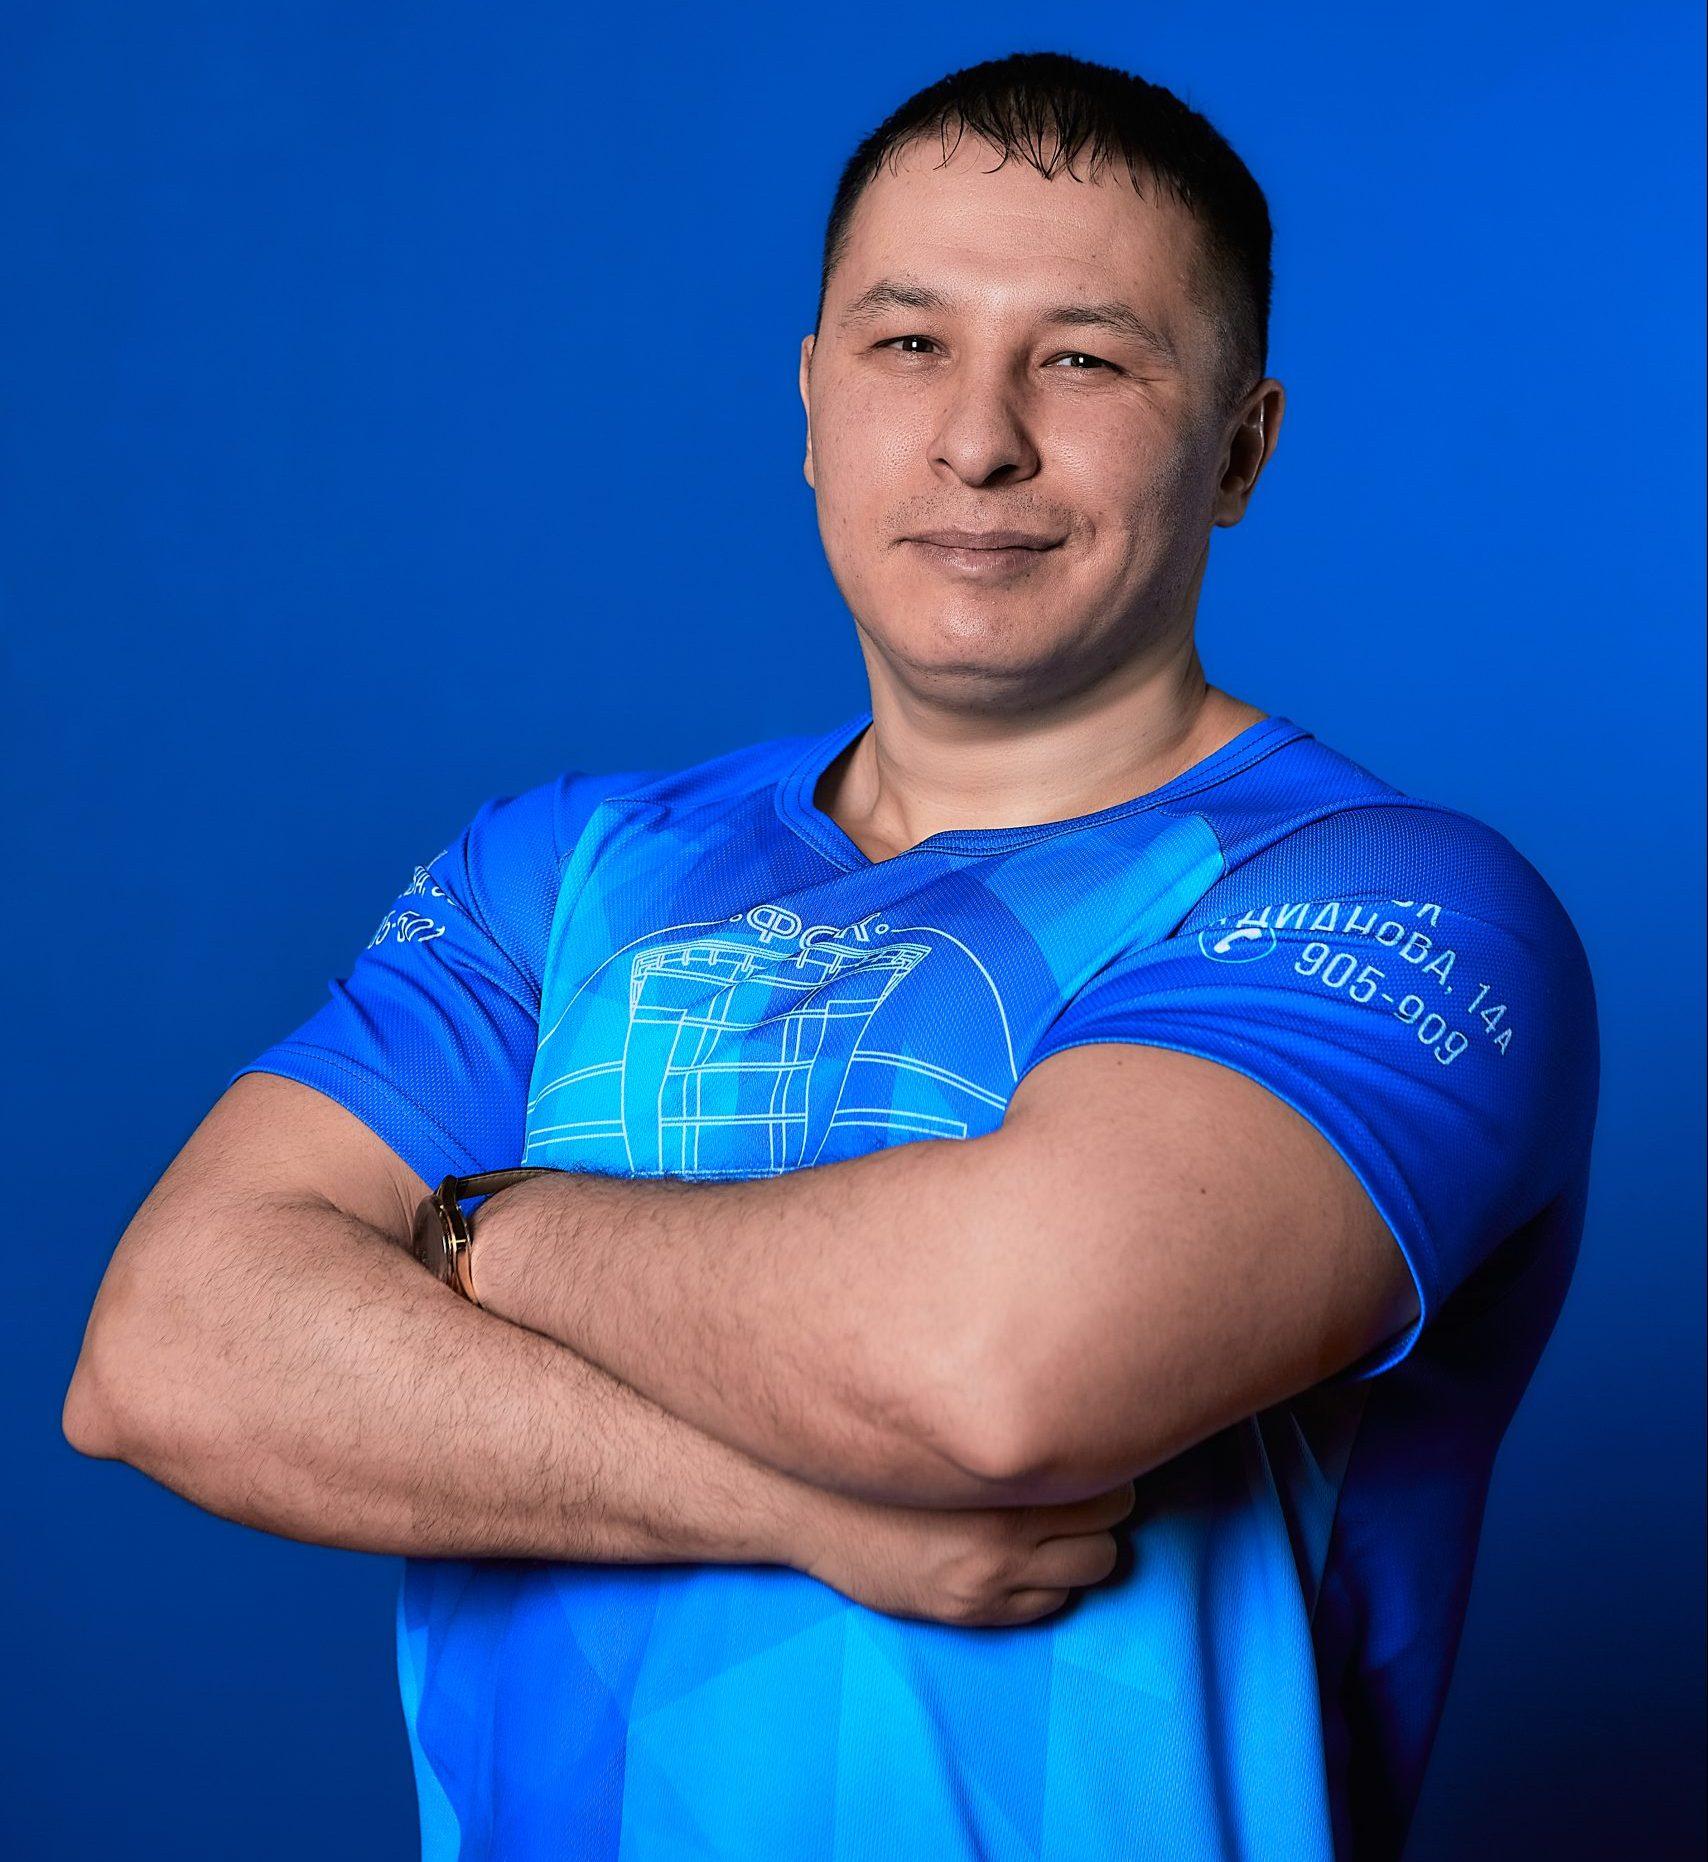 Инструктор Ратмир Сатышев